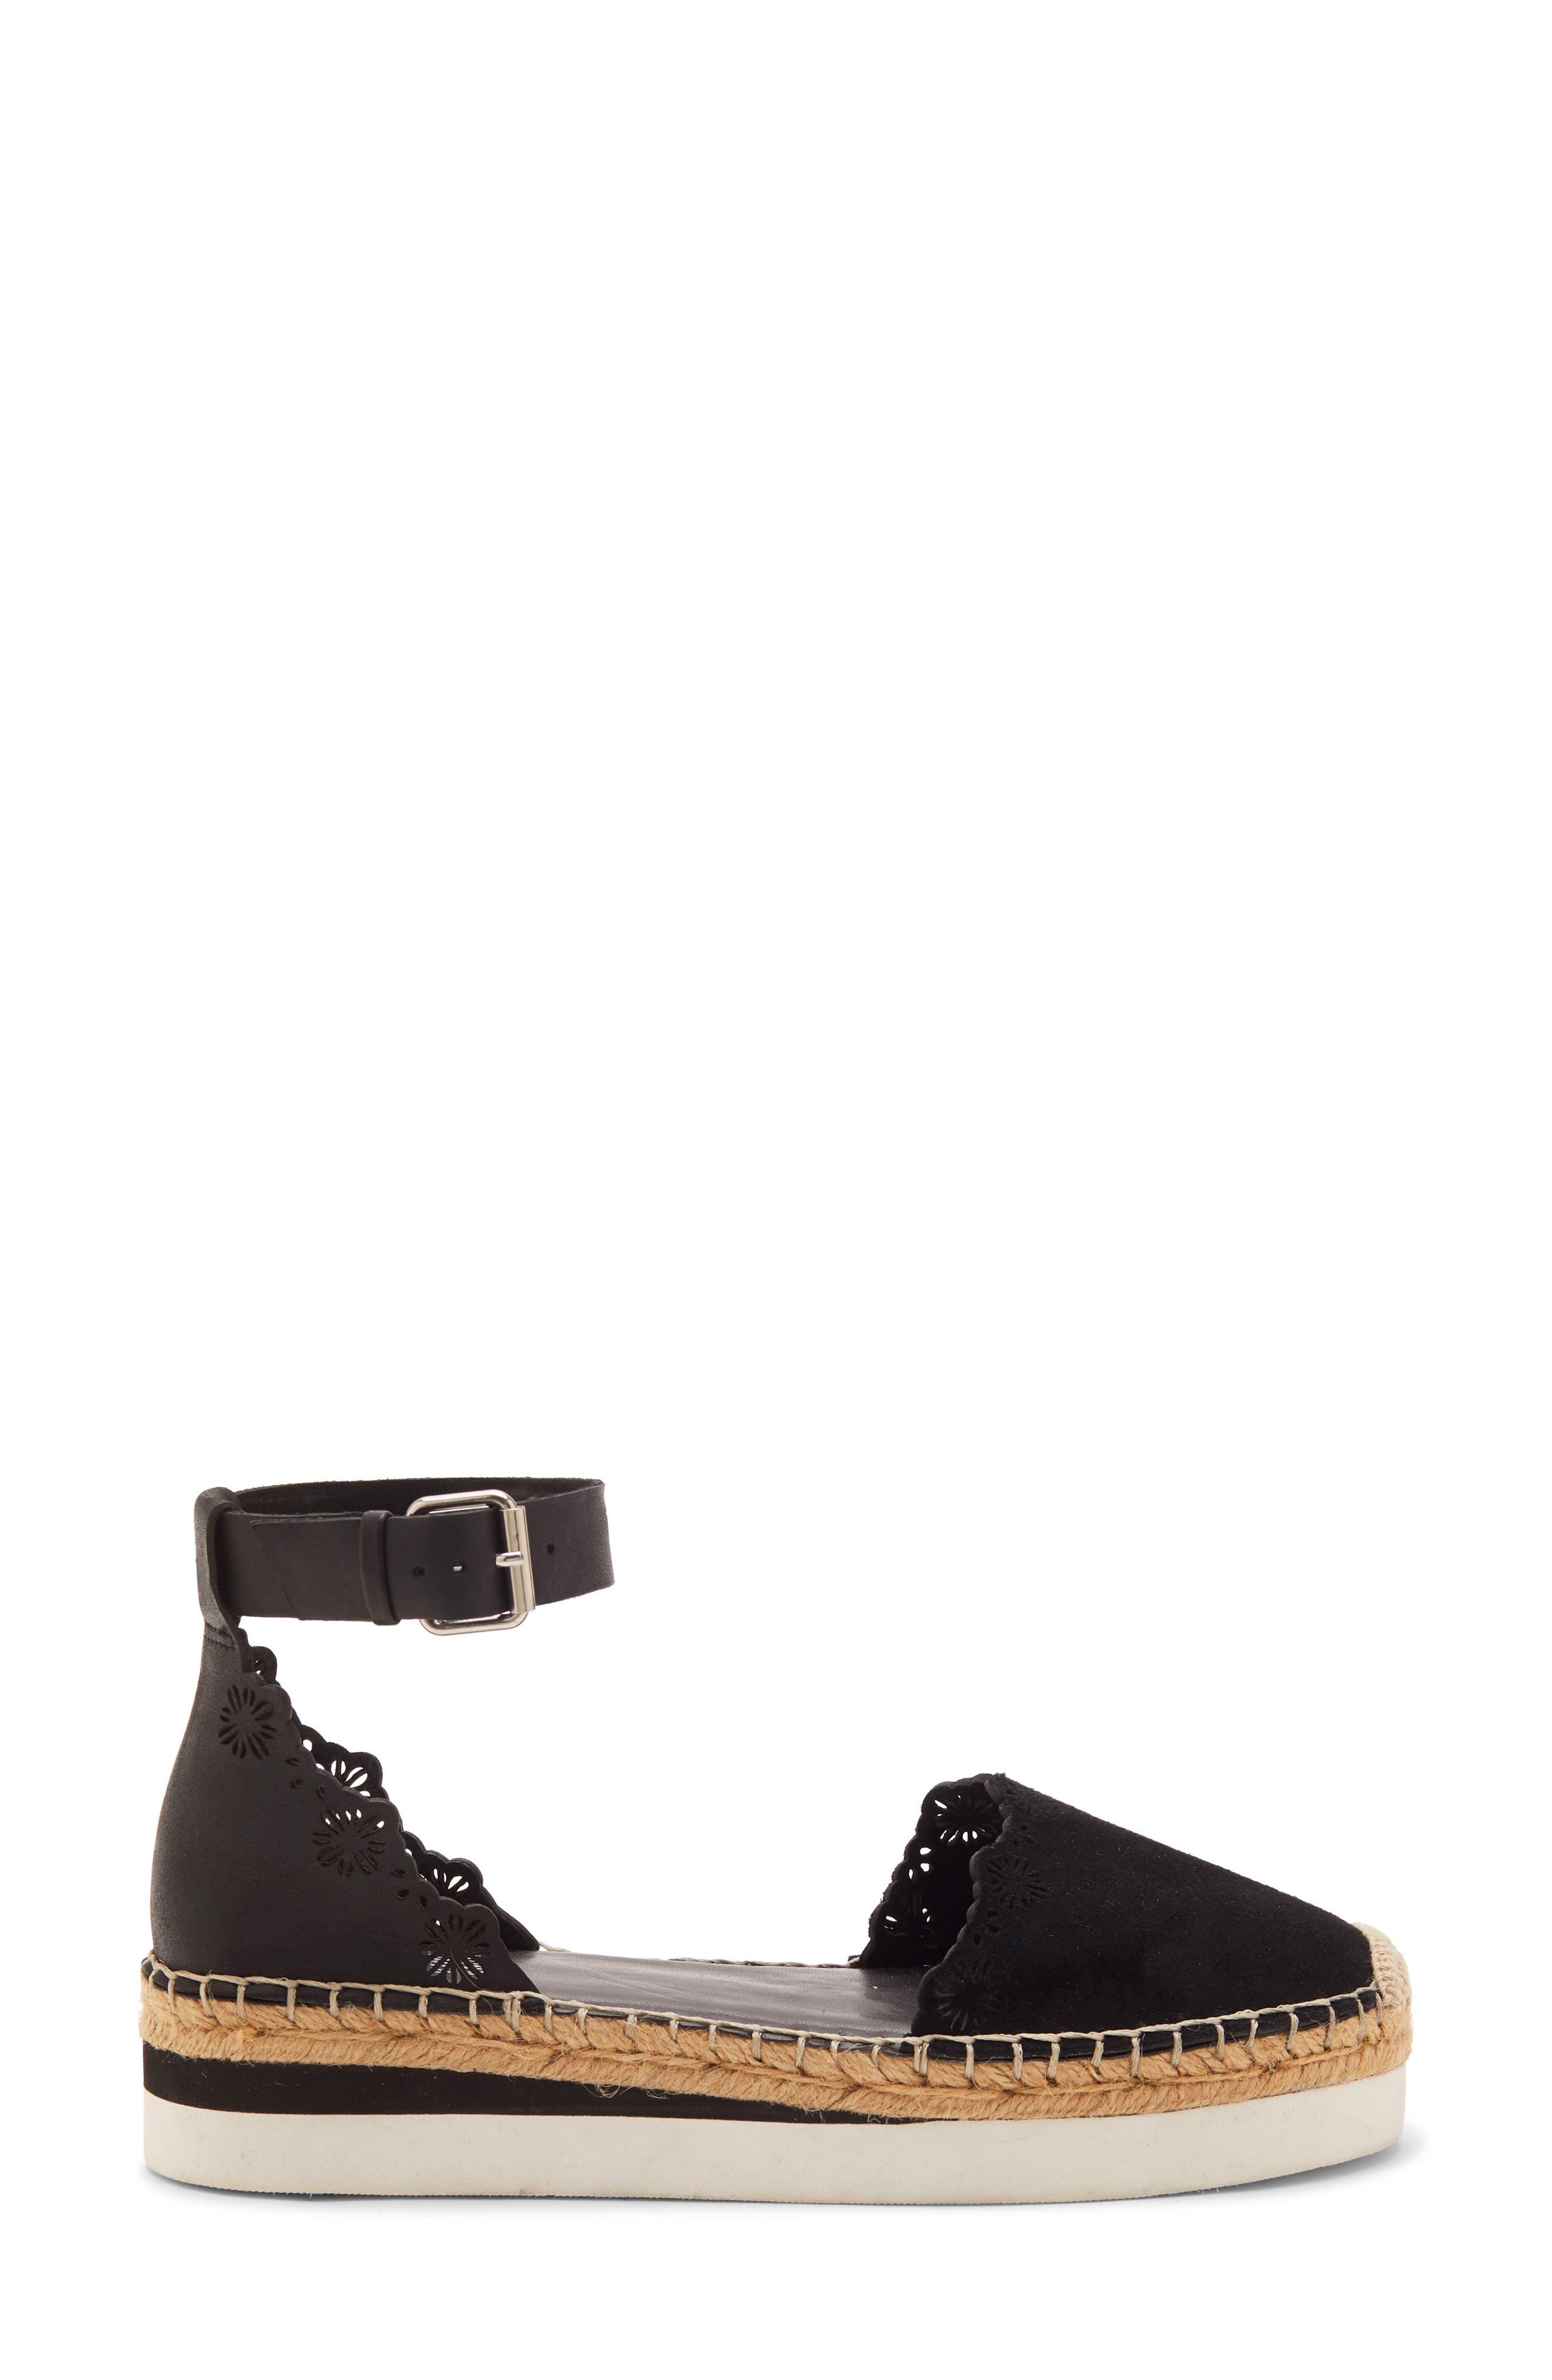 VINCE CAMUTO,                             Breshan Ankle Strap Espadrille Wedge,                             Alternate thumbnail 3, color,                             BLACK SUEDE